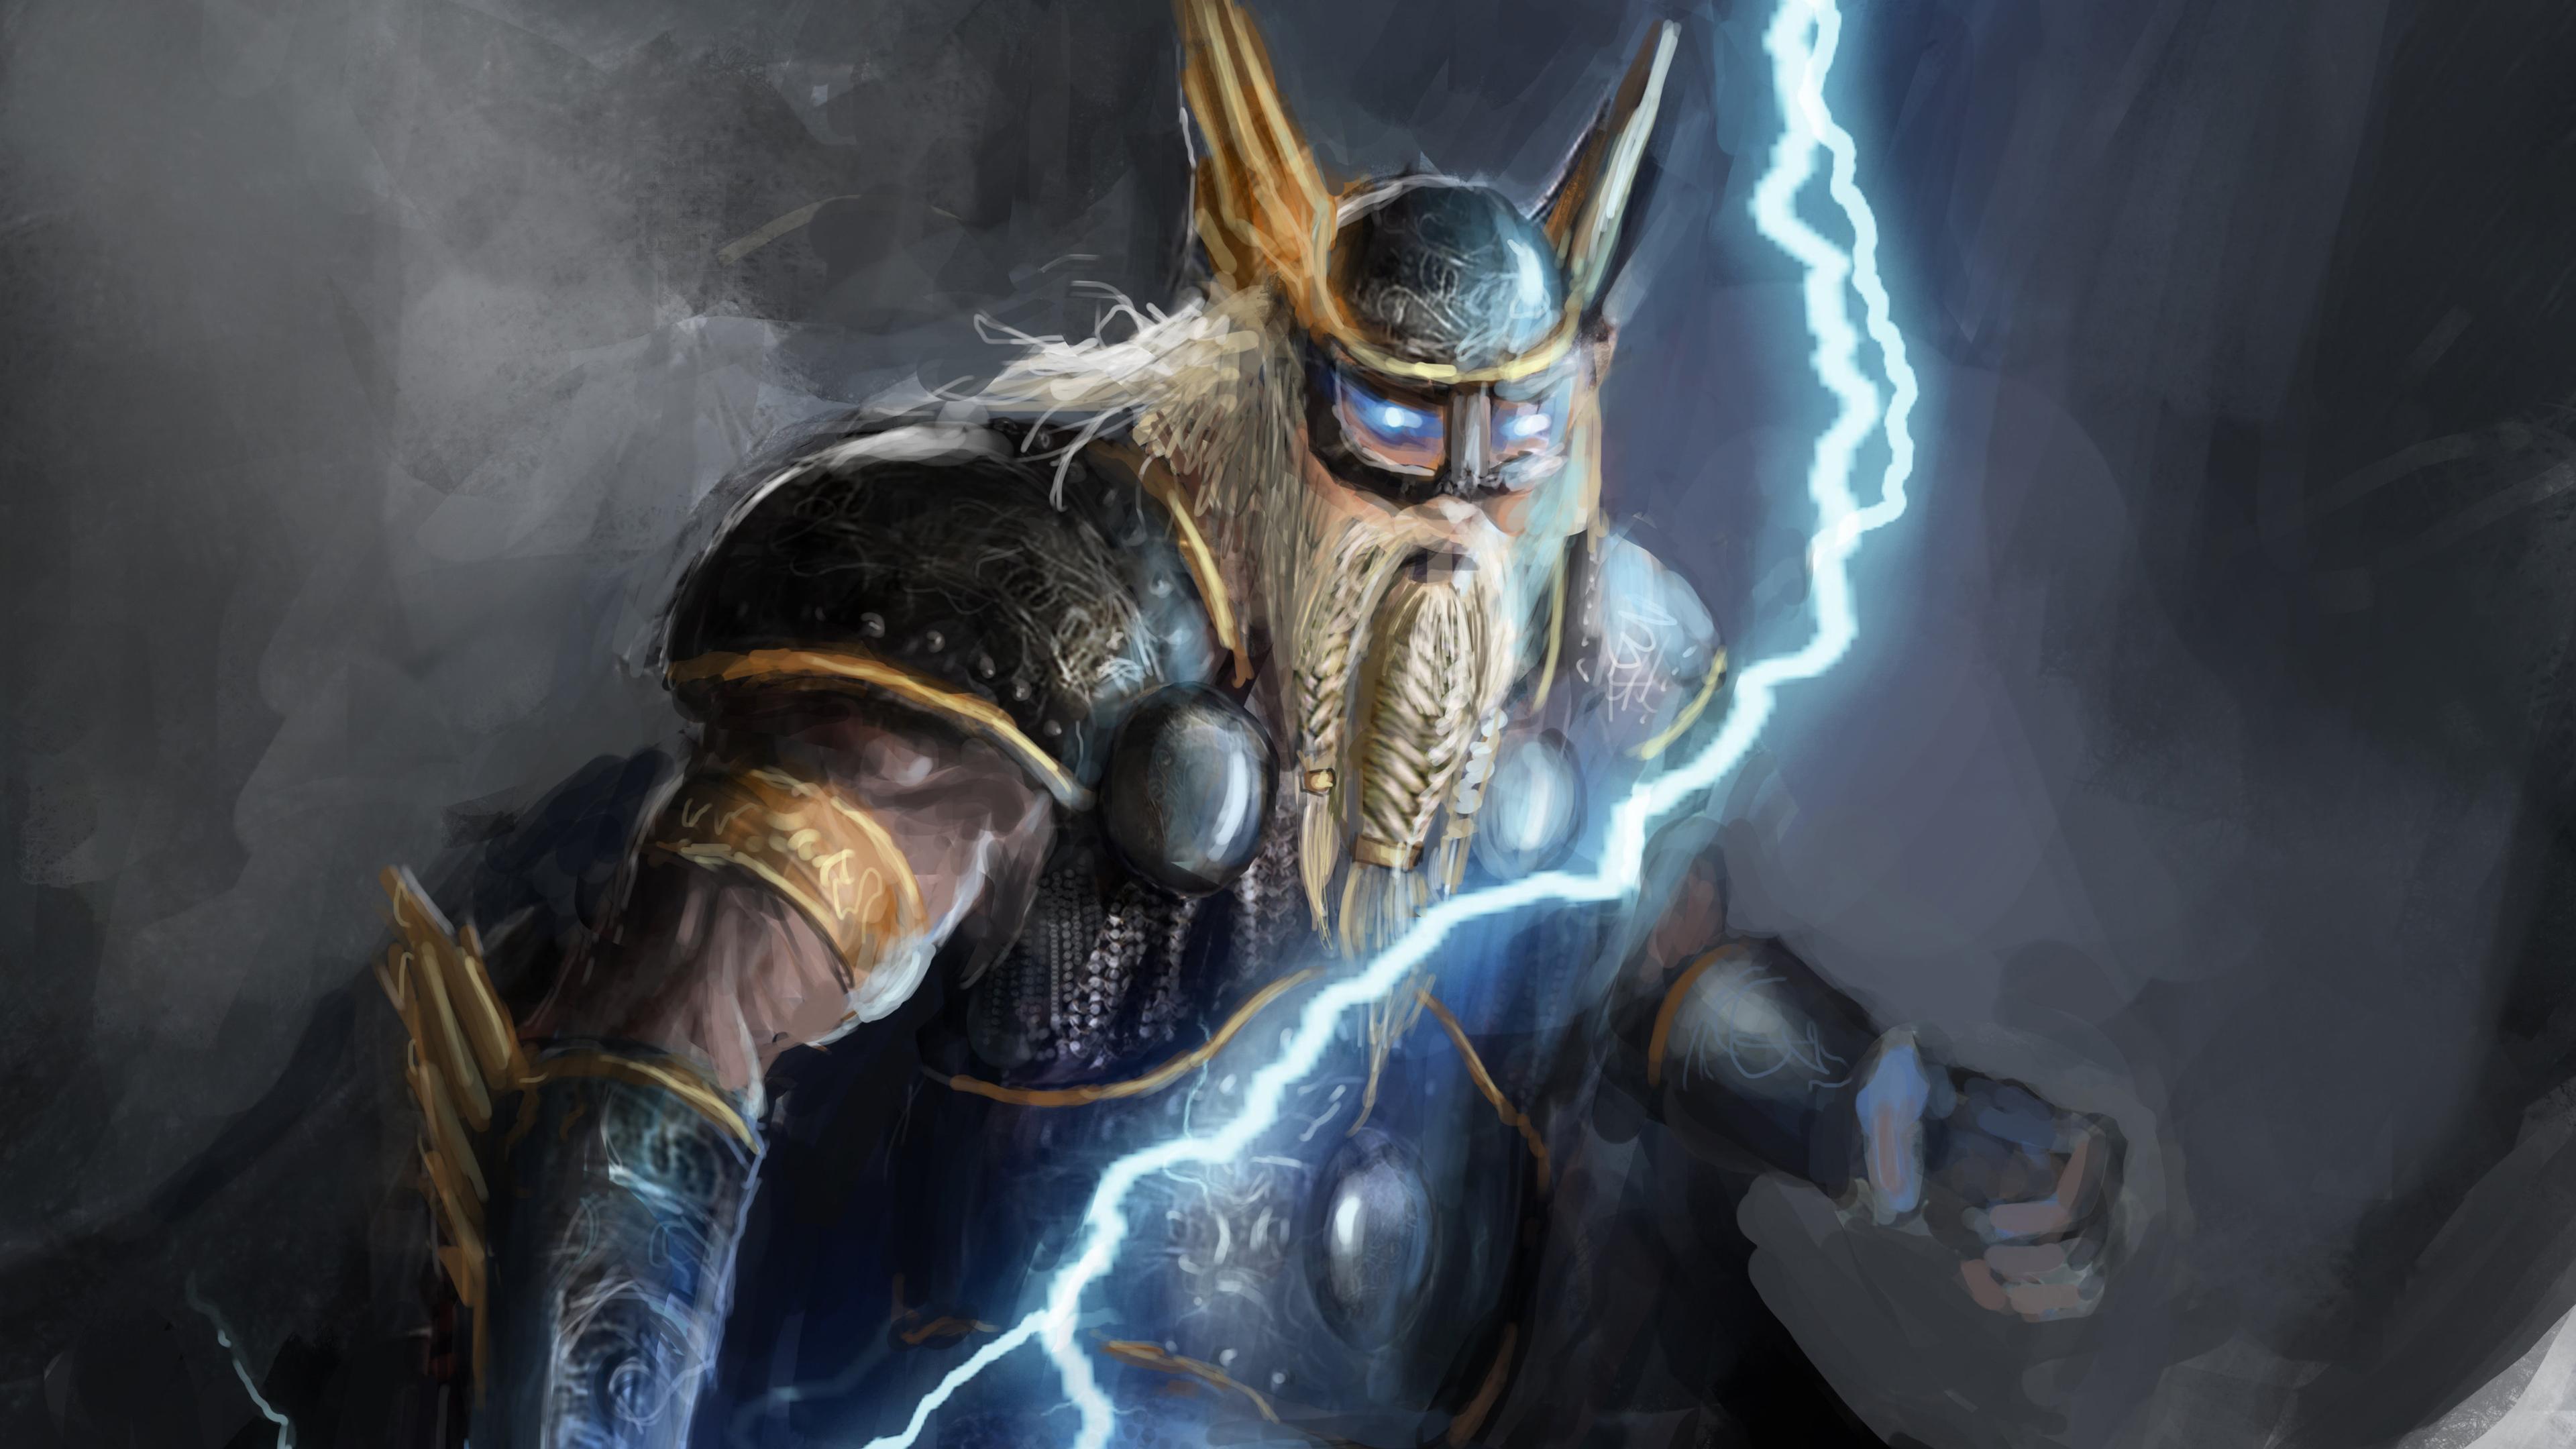 norse god of lightning 4k 1553071272 - Norse God Of Lightning 4k - thor wallpapers, superheroes wallpapers, hd-wallpapers, digital art wallpapers, artwork wallpapers, artist wallpapers, 4k-wallpapers